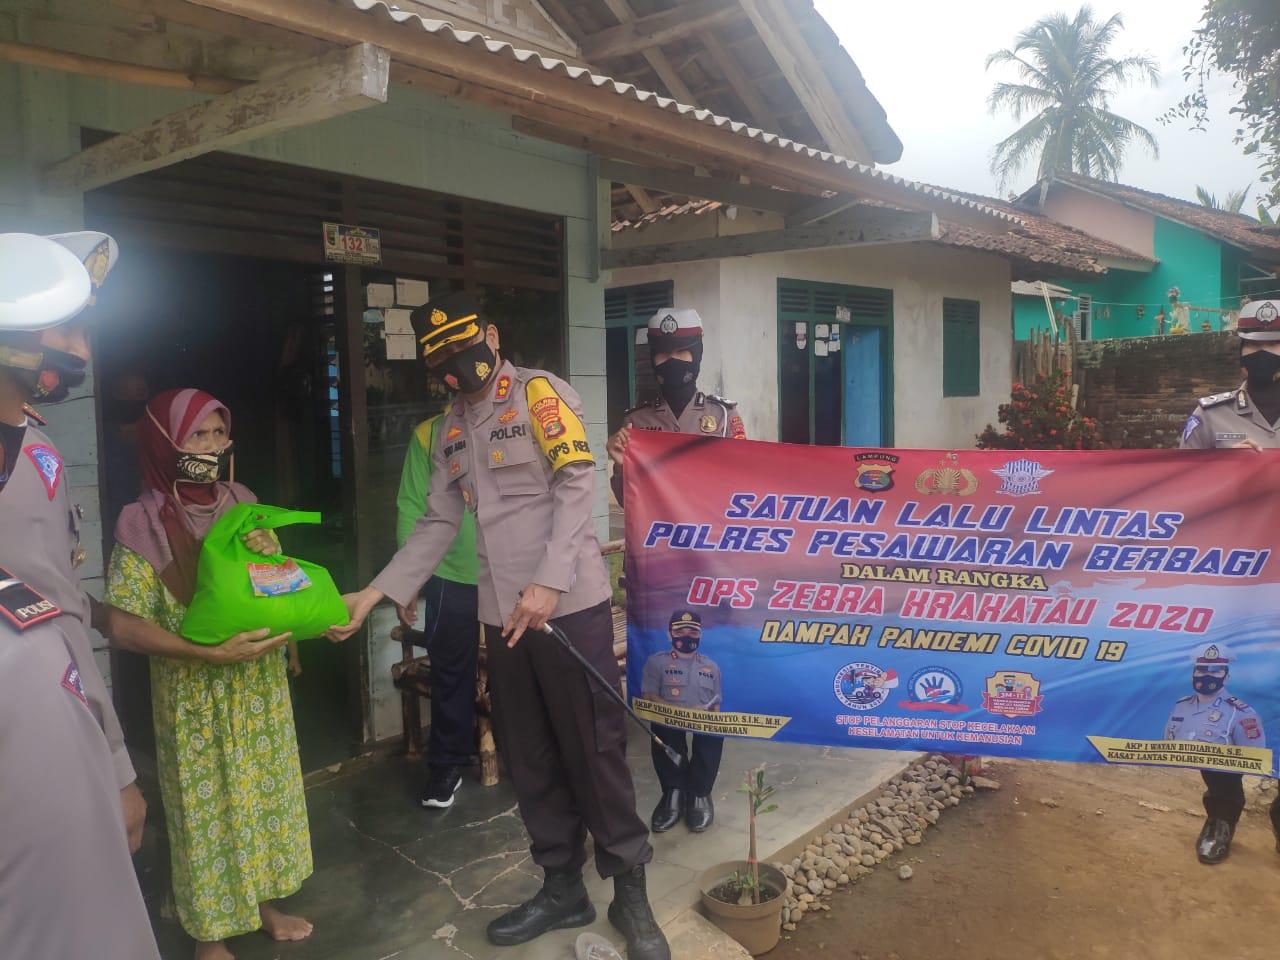 Dalam rangka Ops Zebra Krakatau 2020, Satuan Lalu Lintas (Satlantas) Polres Pesawaran Polda Lampung melaksanakan kegiatan Bakti Sosial Jumat Berkah